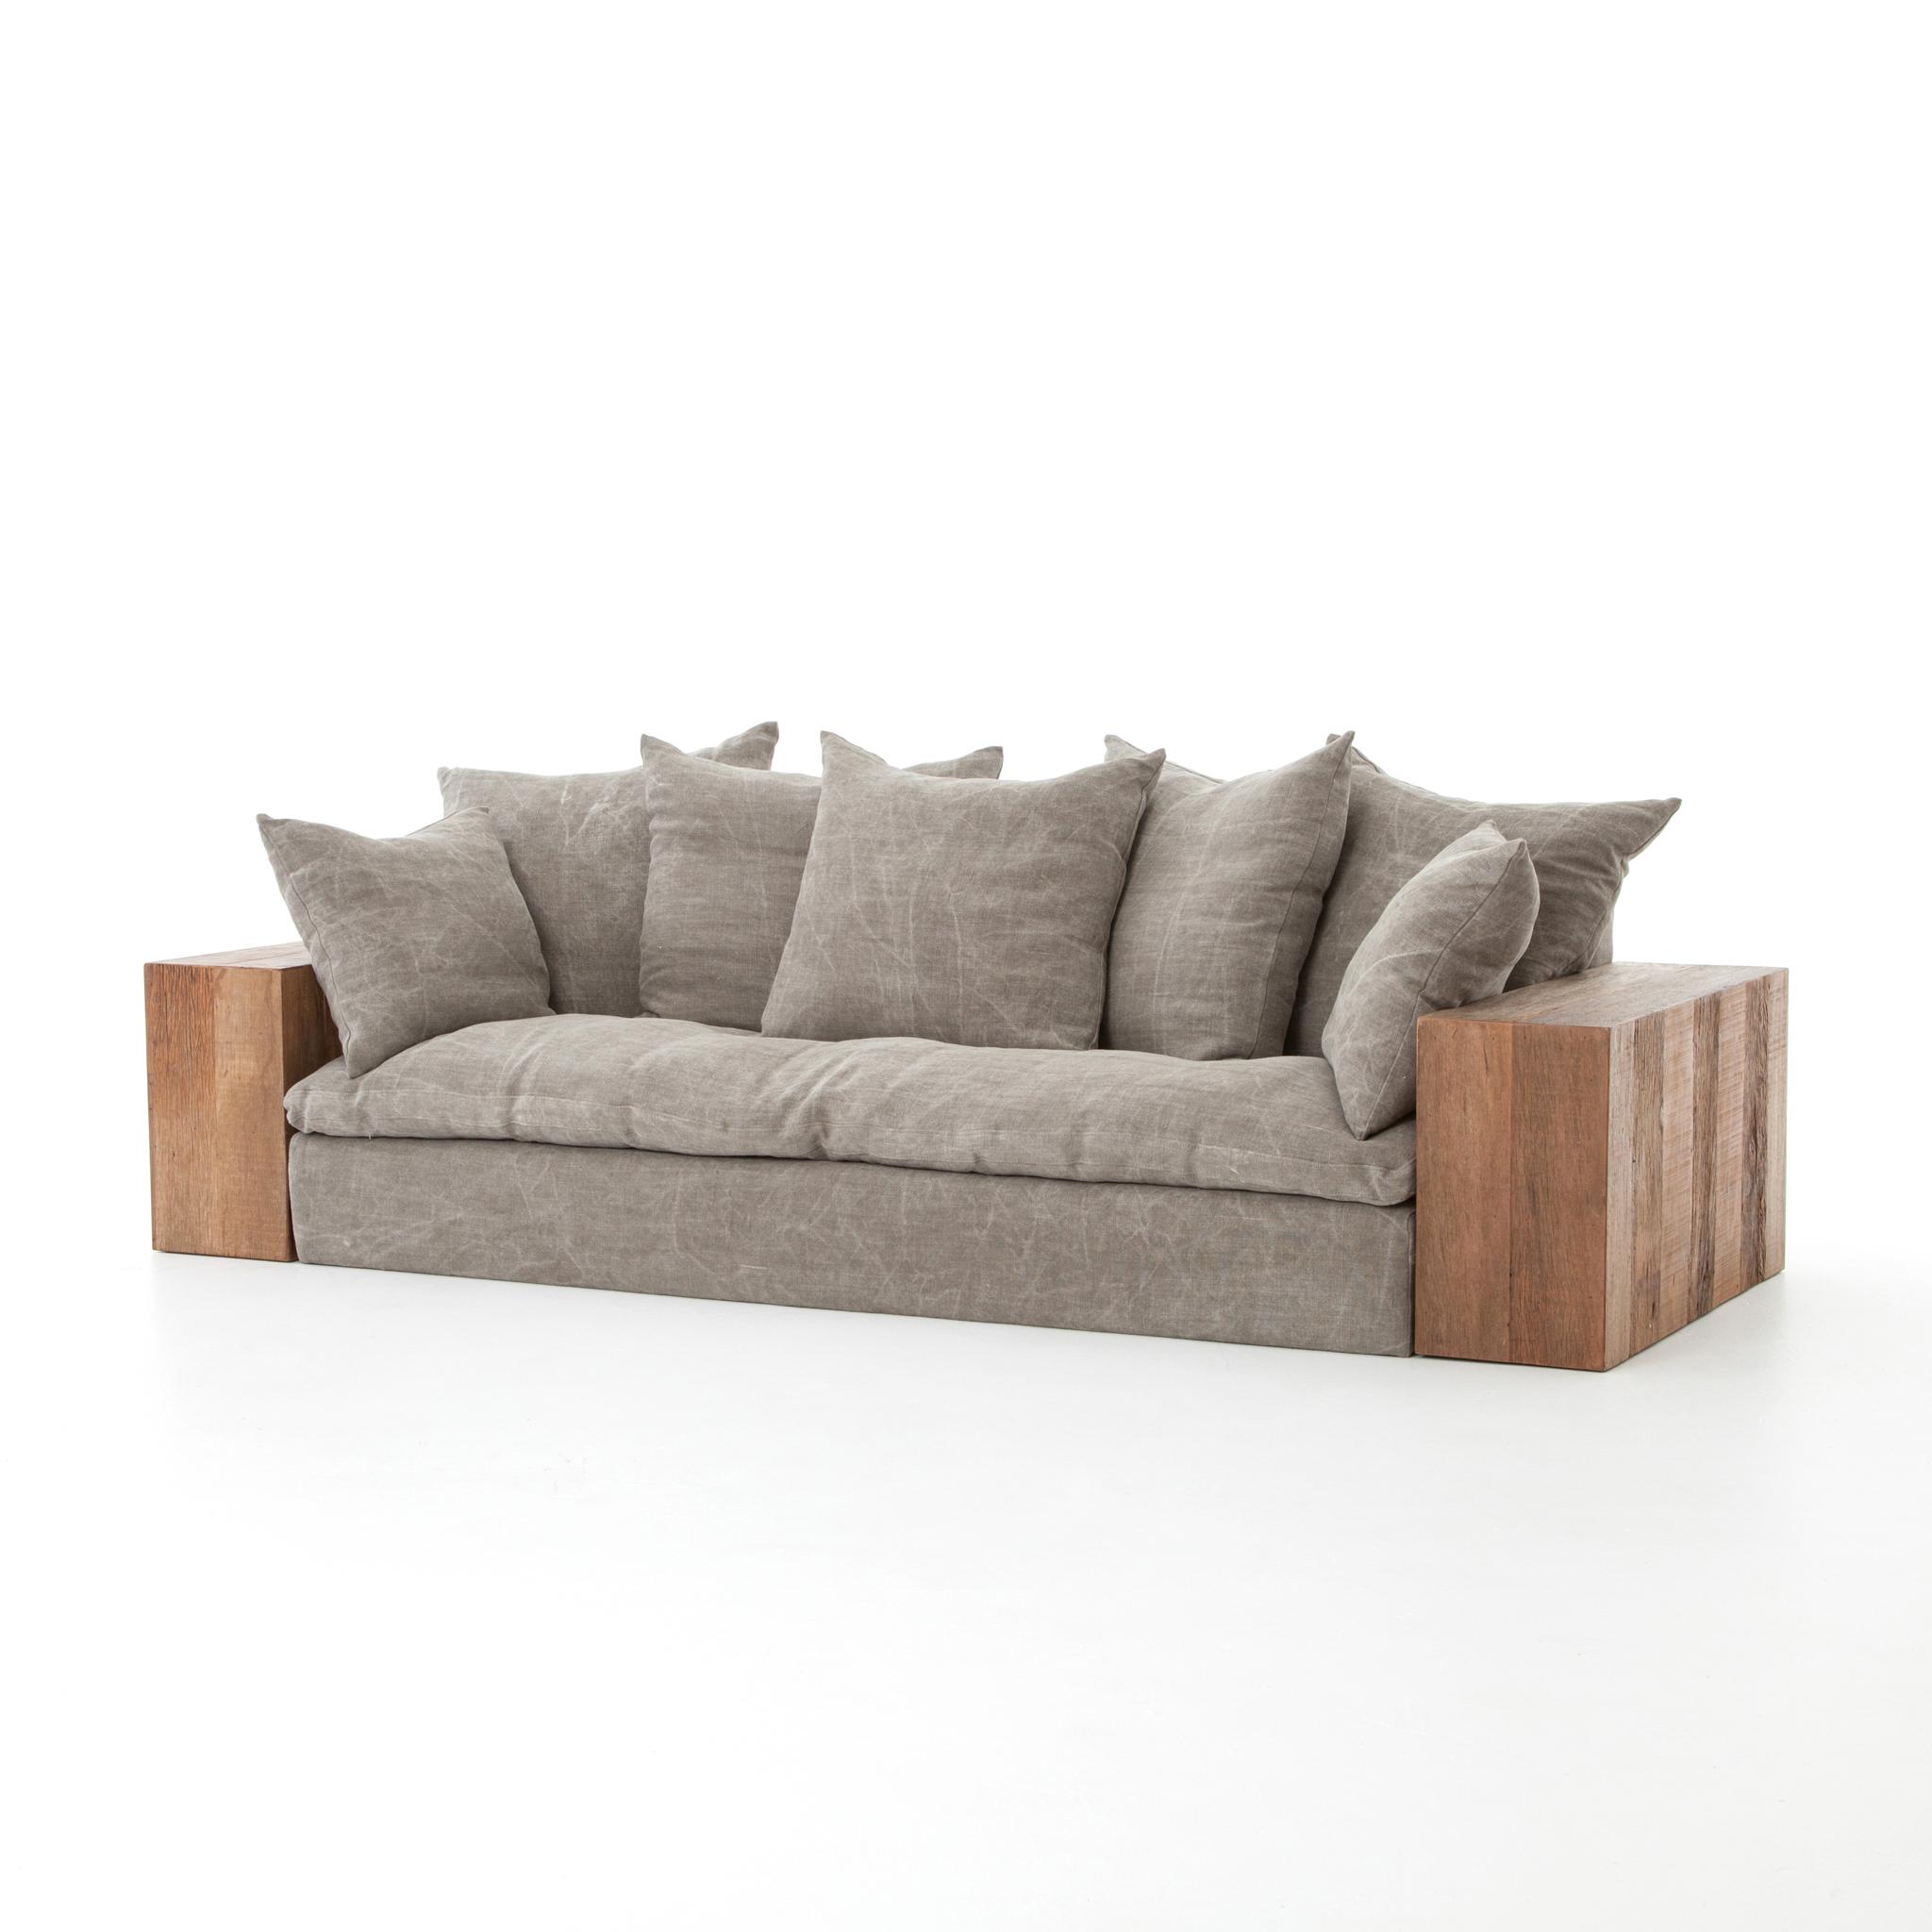 Admirable Dorset Sofa Kit Sw Hvy Jtaup Boulevard Urban Living Inzonedesignstudio Interior Chair Design Inzonedesignstudiocom